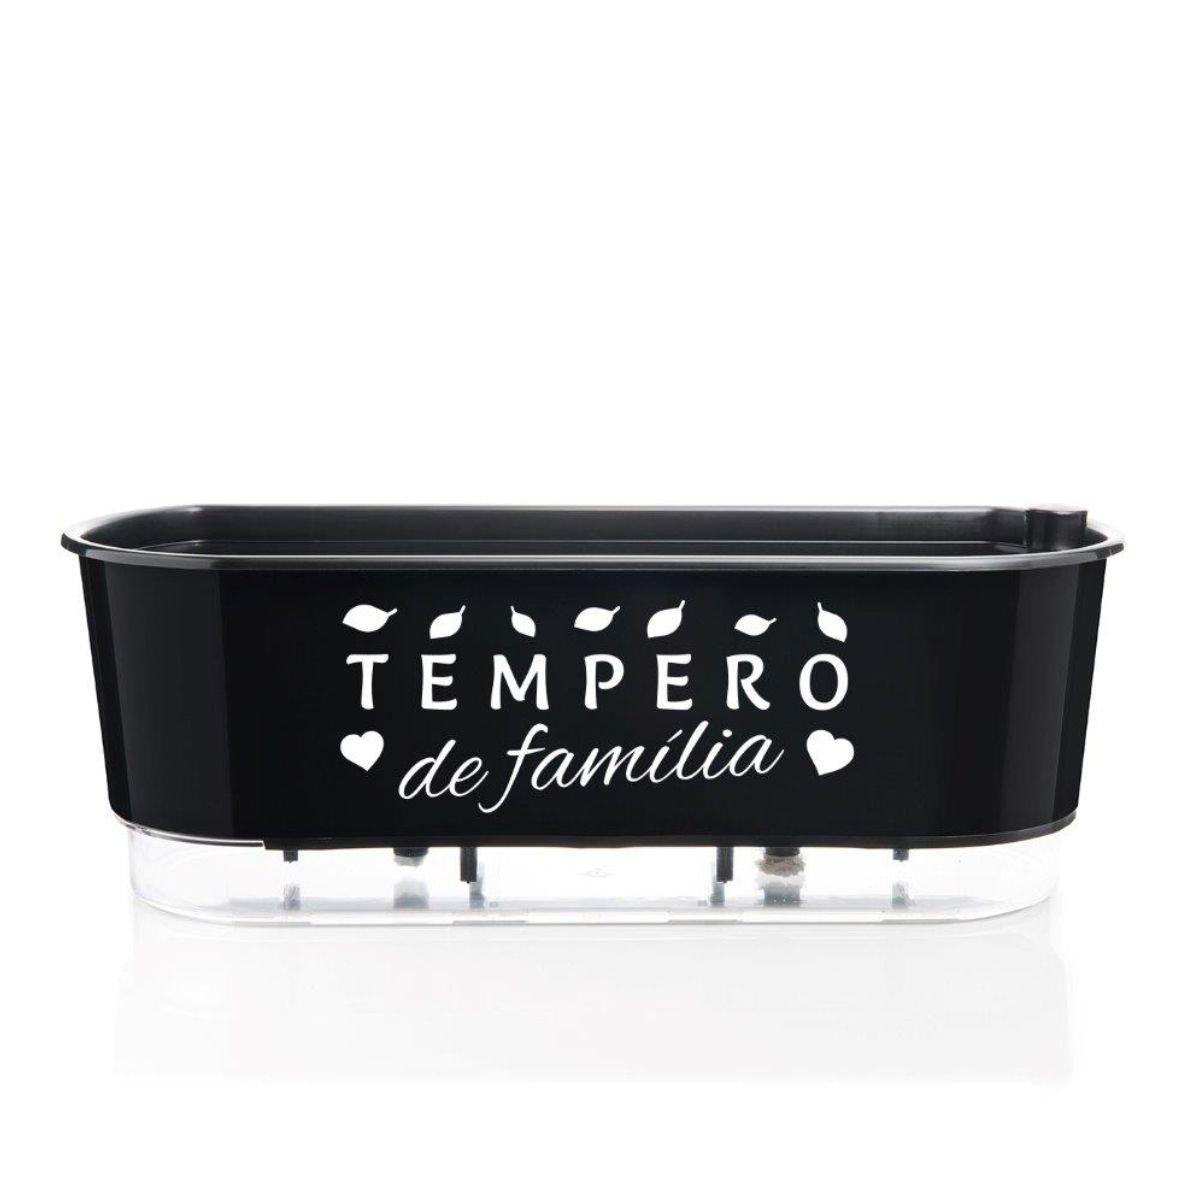 Vaso Autoirrigável Jardineira Tempero de Família Preto 40cm Raiz